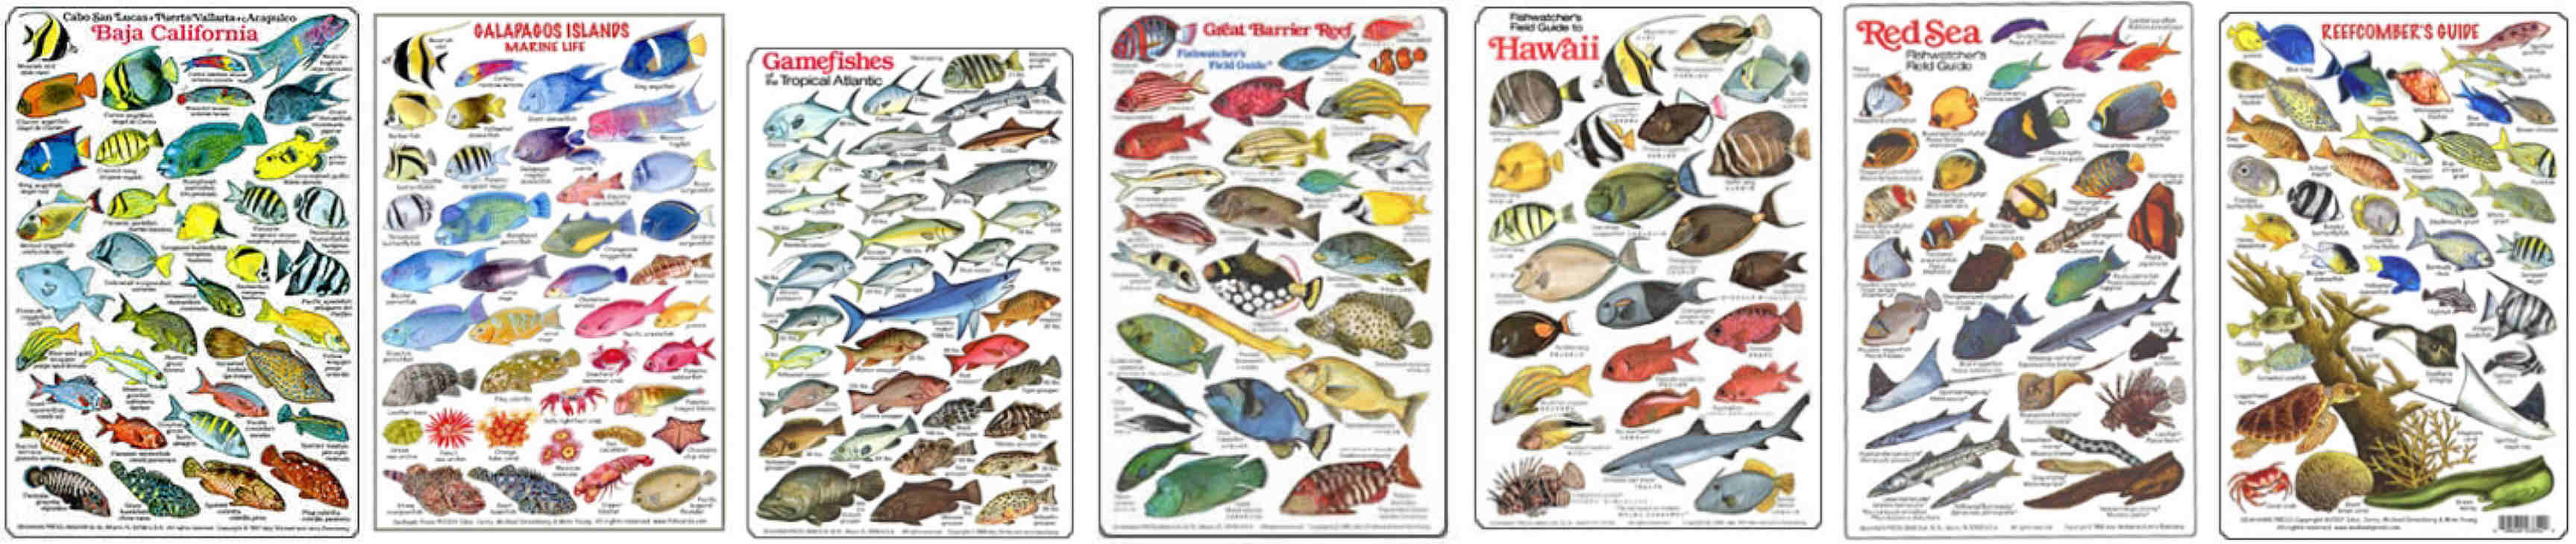 Freshwater aquarium fish identification guide - Fish Identification Guides Diving Slates And Fish Charts